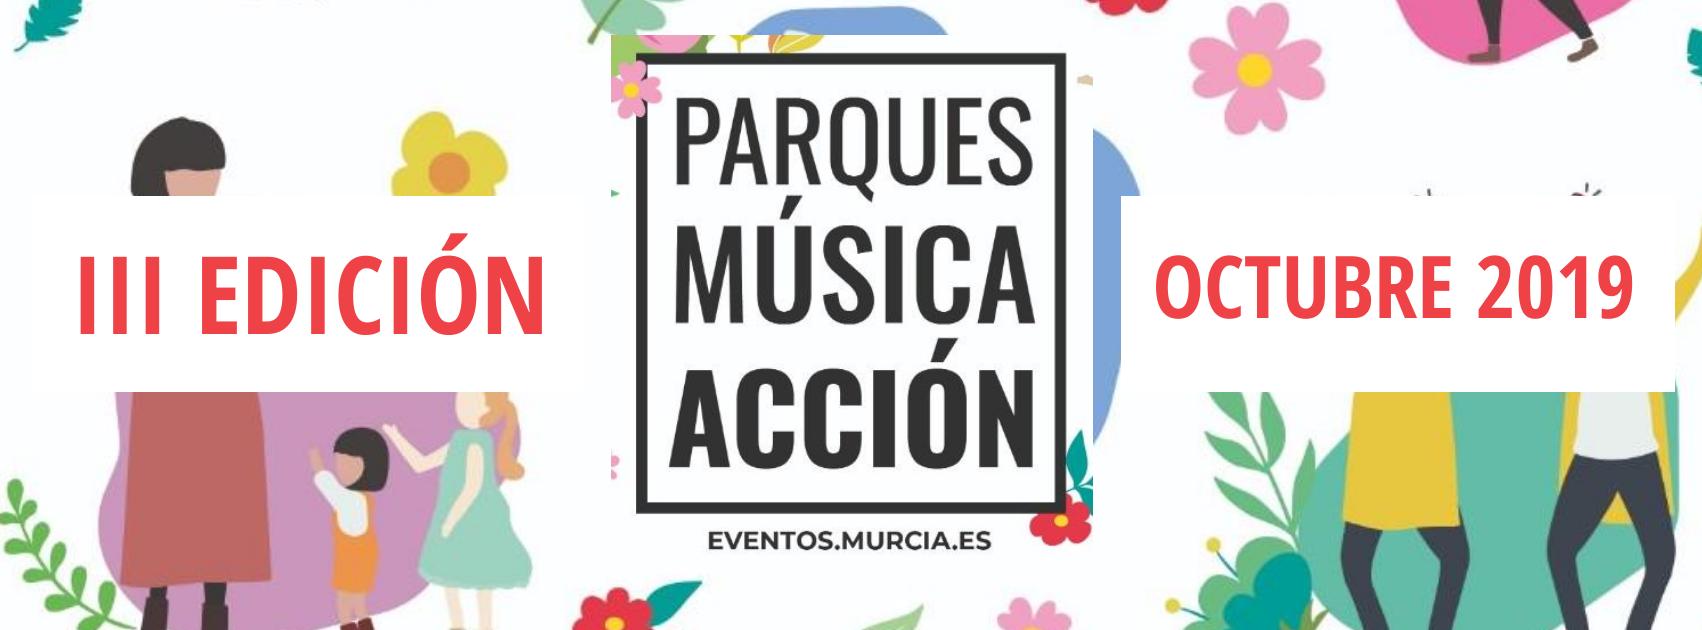 parques-musica-accion.png